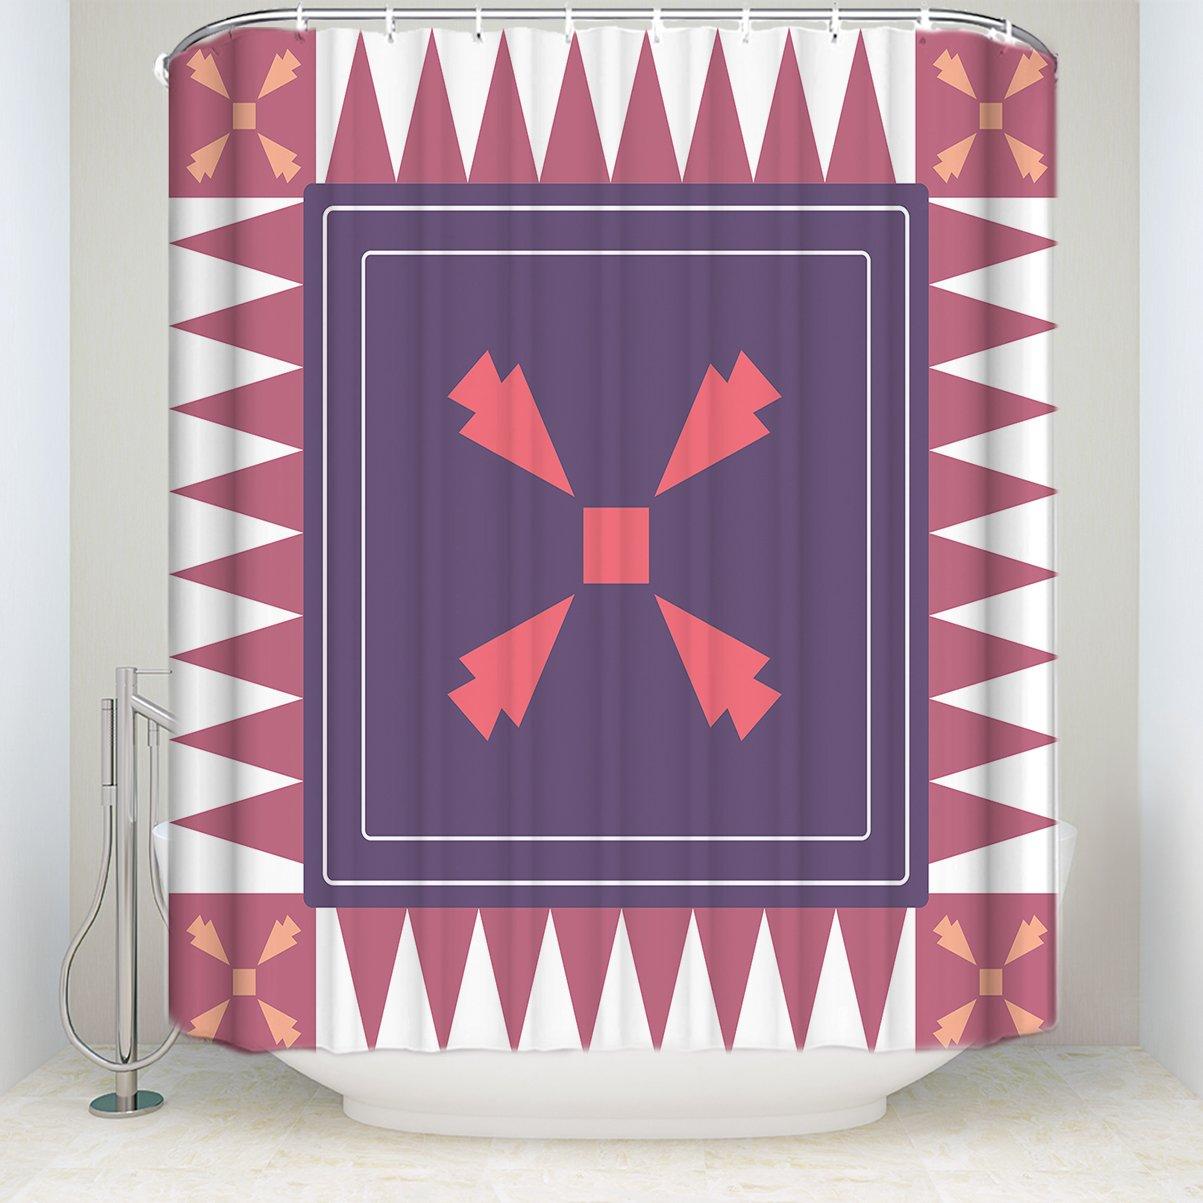 Repeated Geometric Square Figures Printed Patteren Shower Curtain Hooks Waterproof Mildew Resistant Polyester Fabric Bath Curtains Bathroom Showers Bathtubs 36 x 72 Women Trend HZY0428-TK-HILDA-0442-1